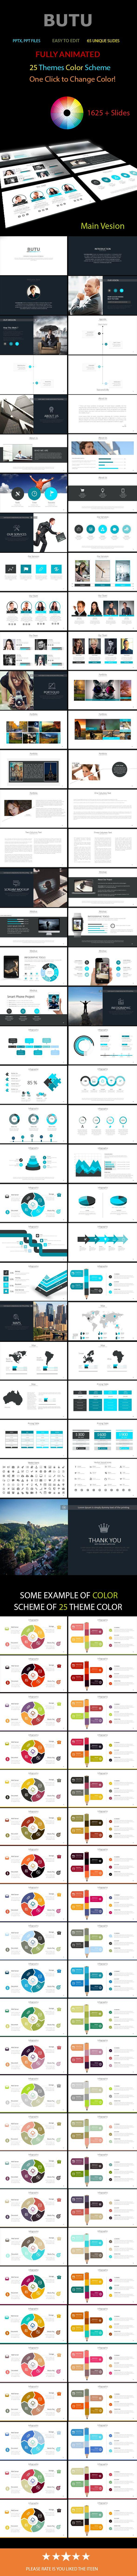 Butu V.4 Powerpoint Presentation (PowerPoint Templates)